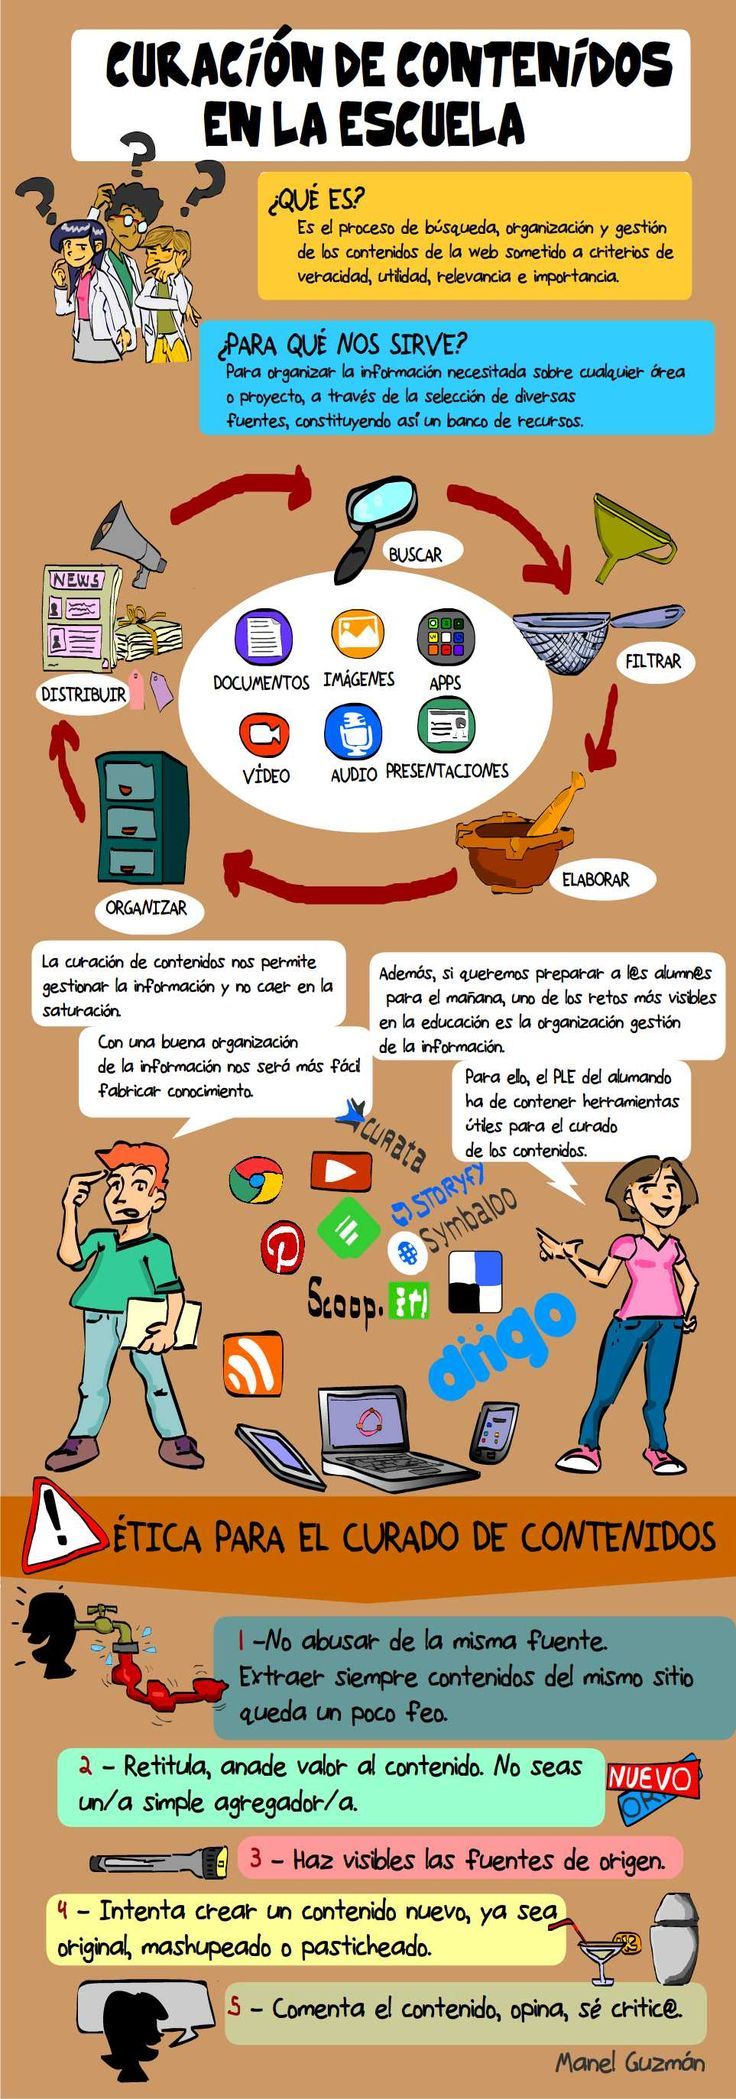 Curación de contenidos para la escuela/ Informazioaren bilaketa eta analisia #Lauaxetaikastola #educación